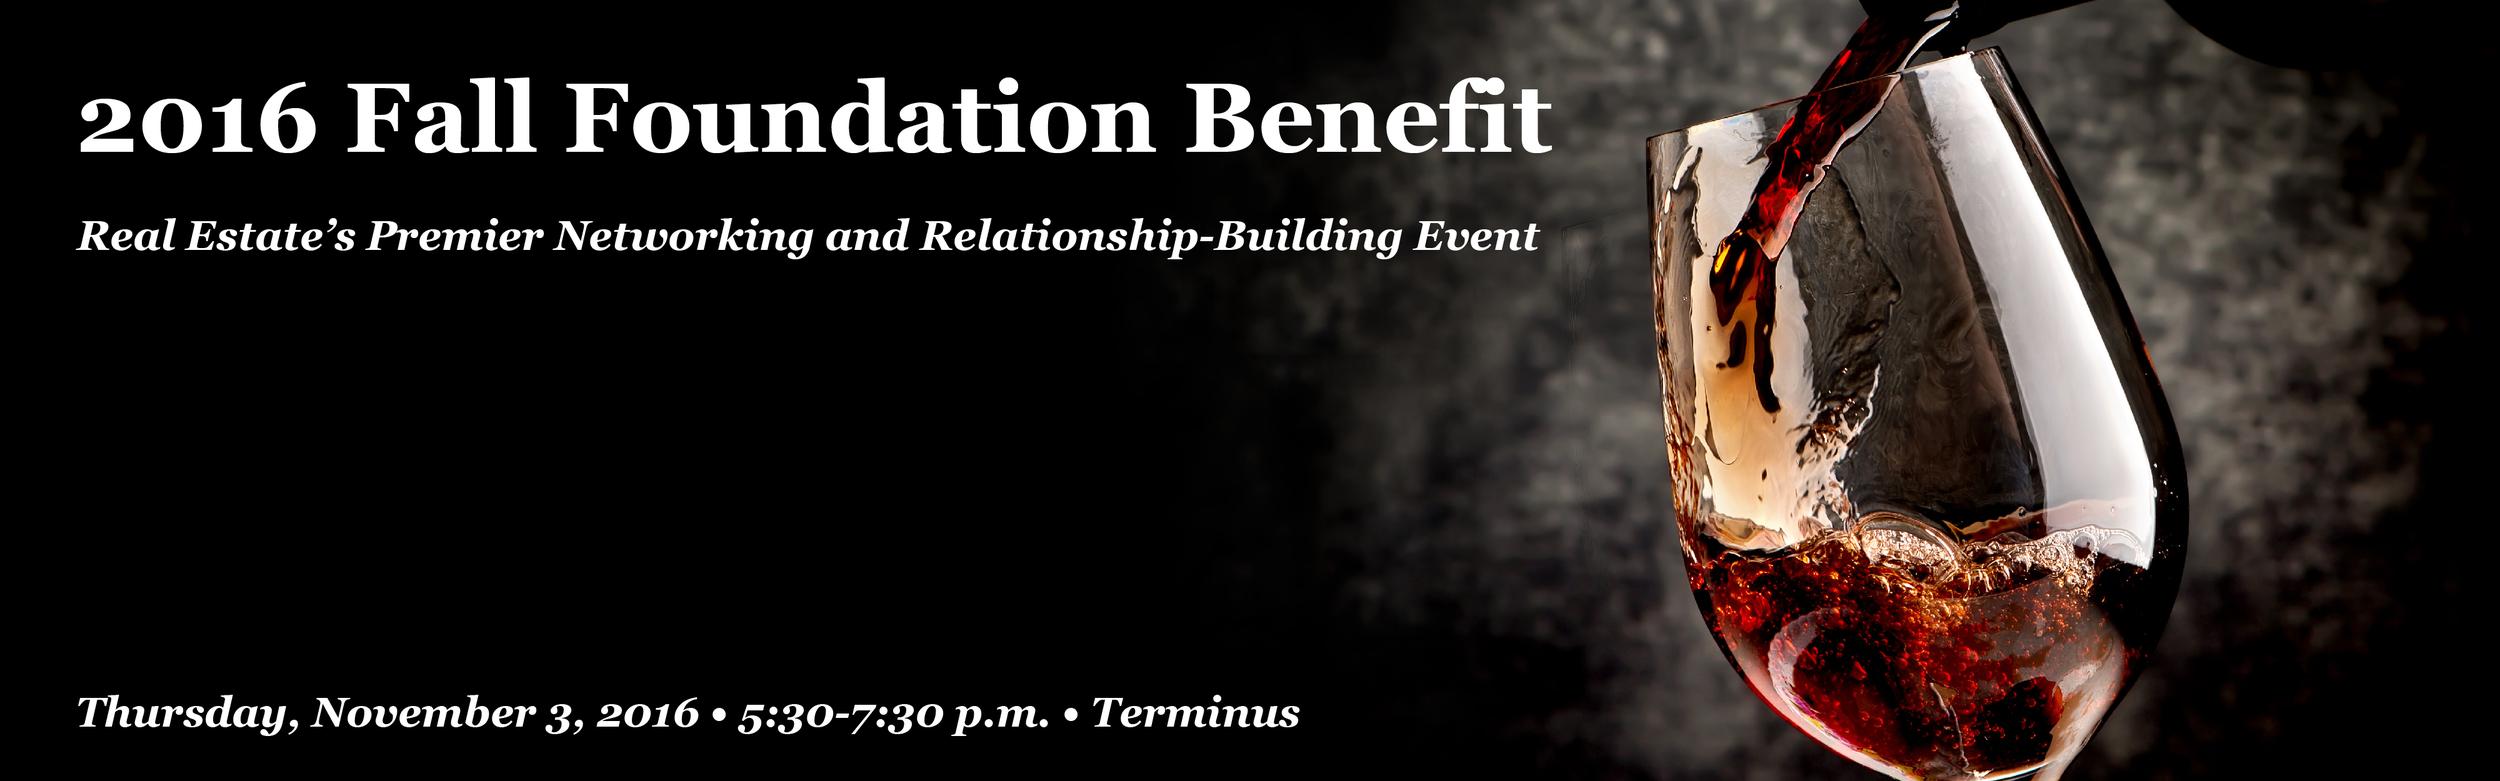 16-foundation-benefit-head